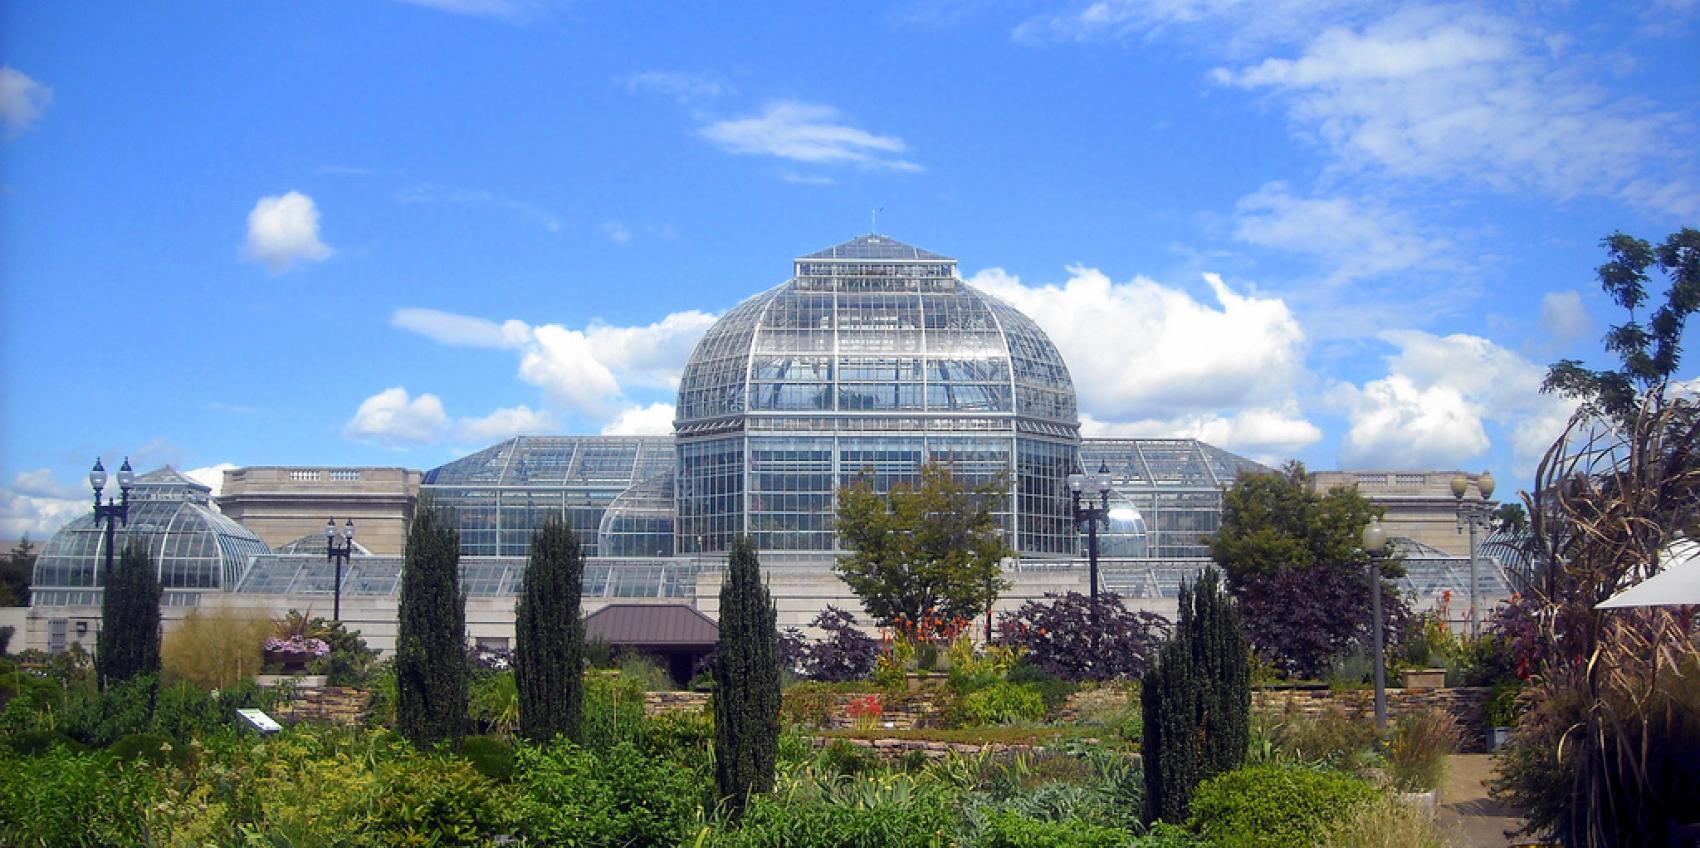 united states botanic garden | american public gardens association